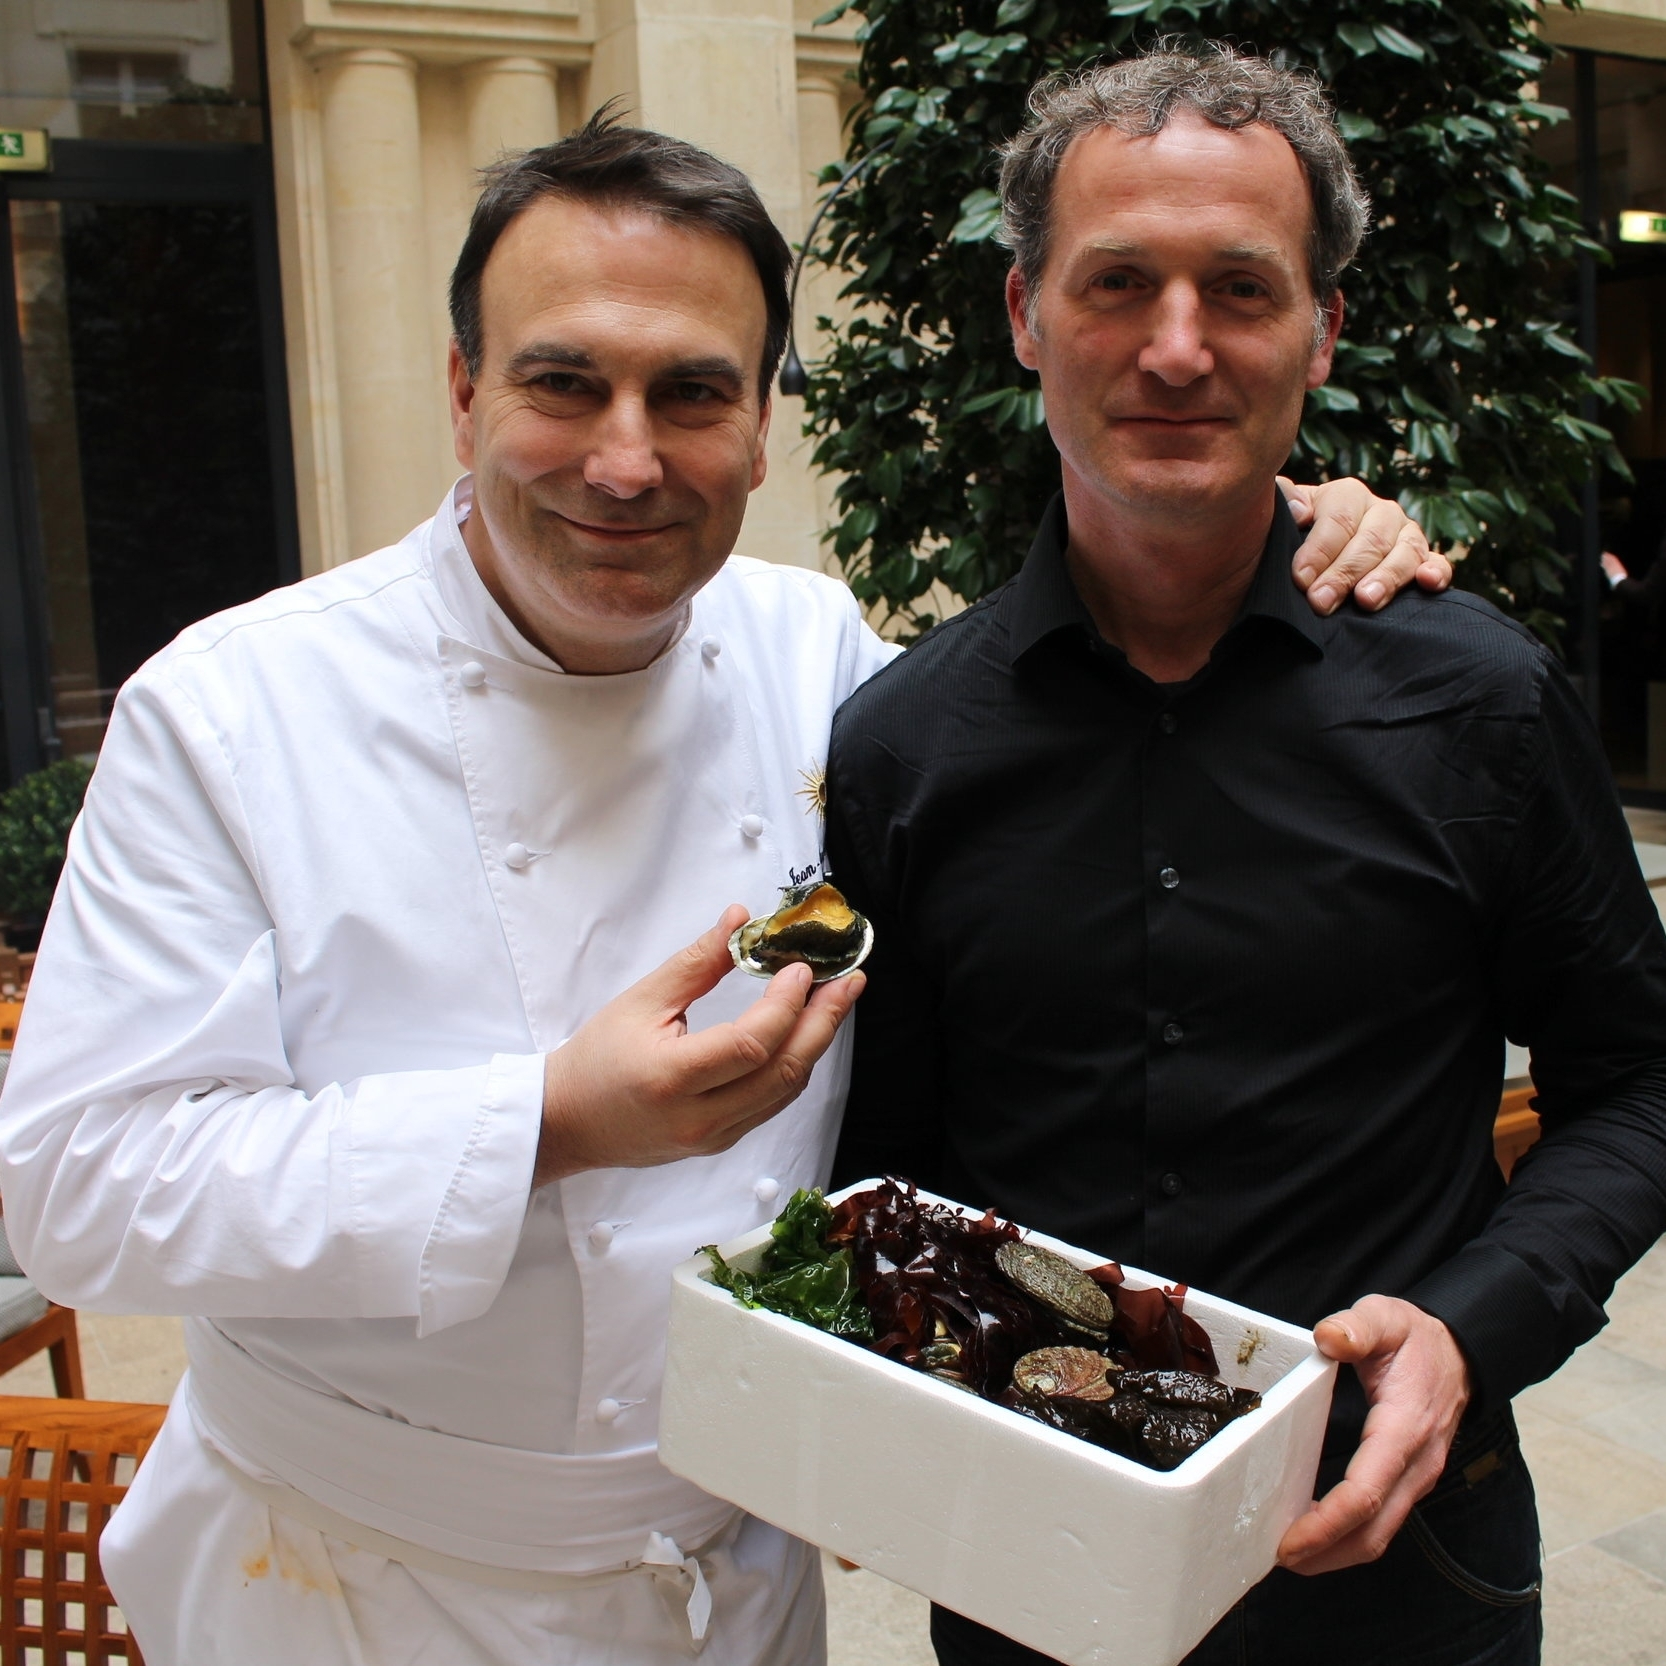 Abalone supplier - Pur'- Jean-François Rouquette - Michelin Star Restaurant in Paris